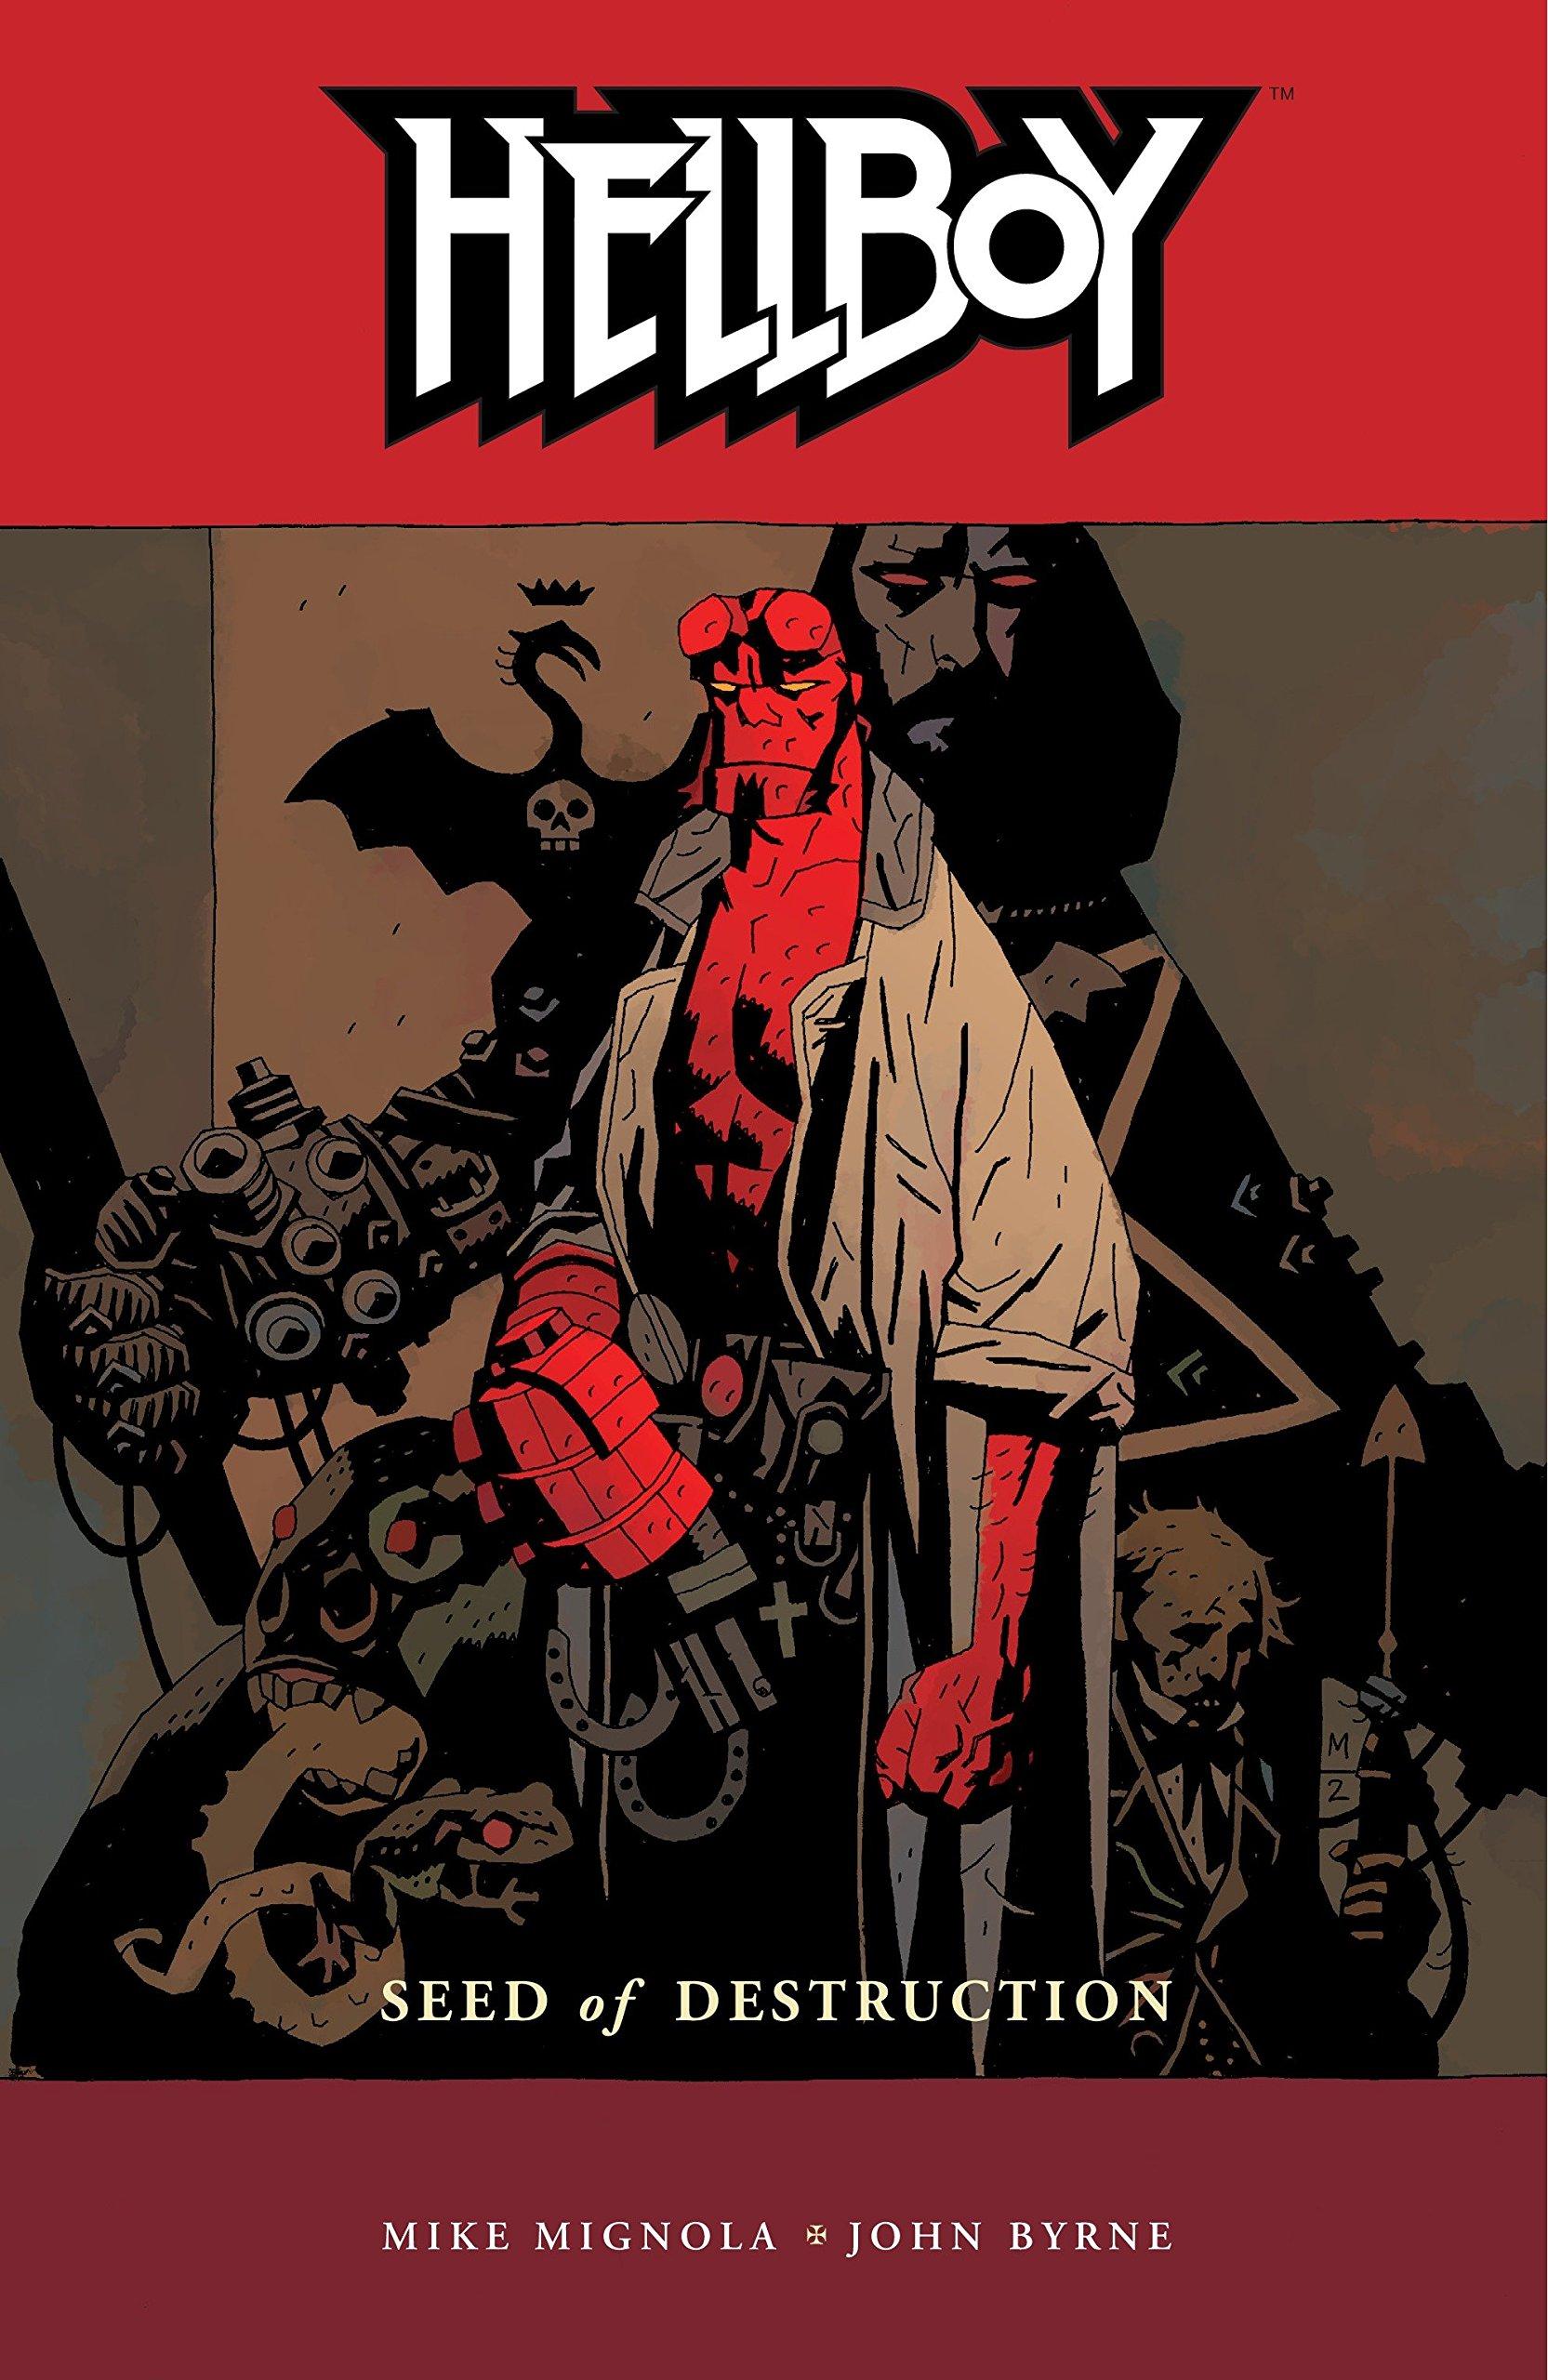 Read Hellboy Vol 1 Seed Of Destruction By Mike Mignola